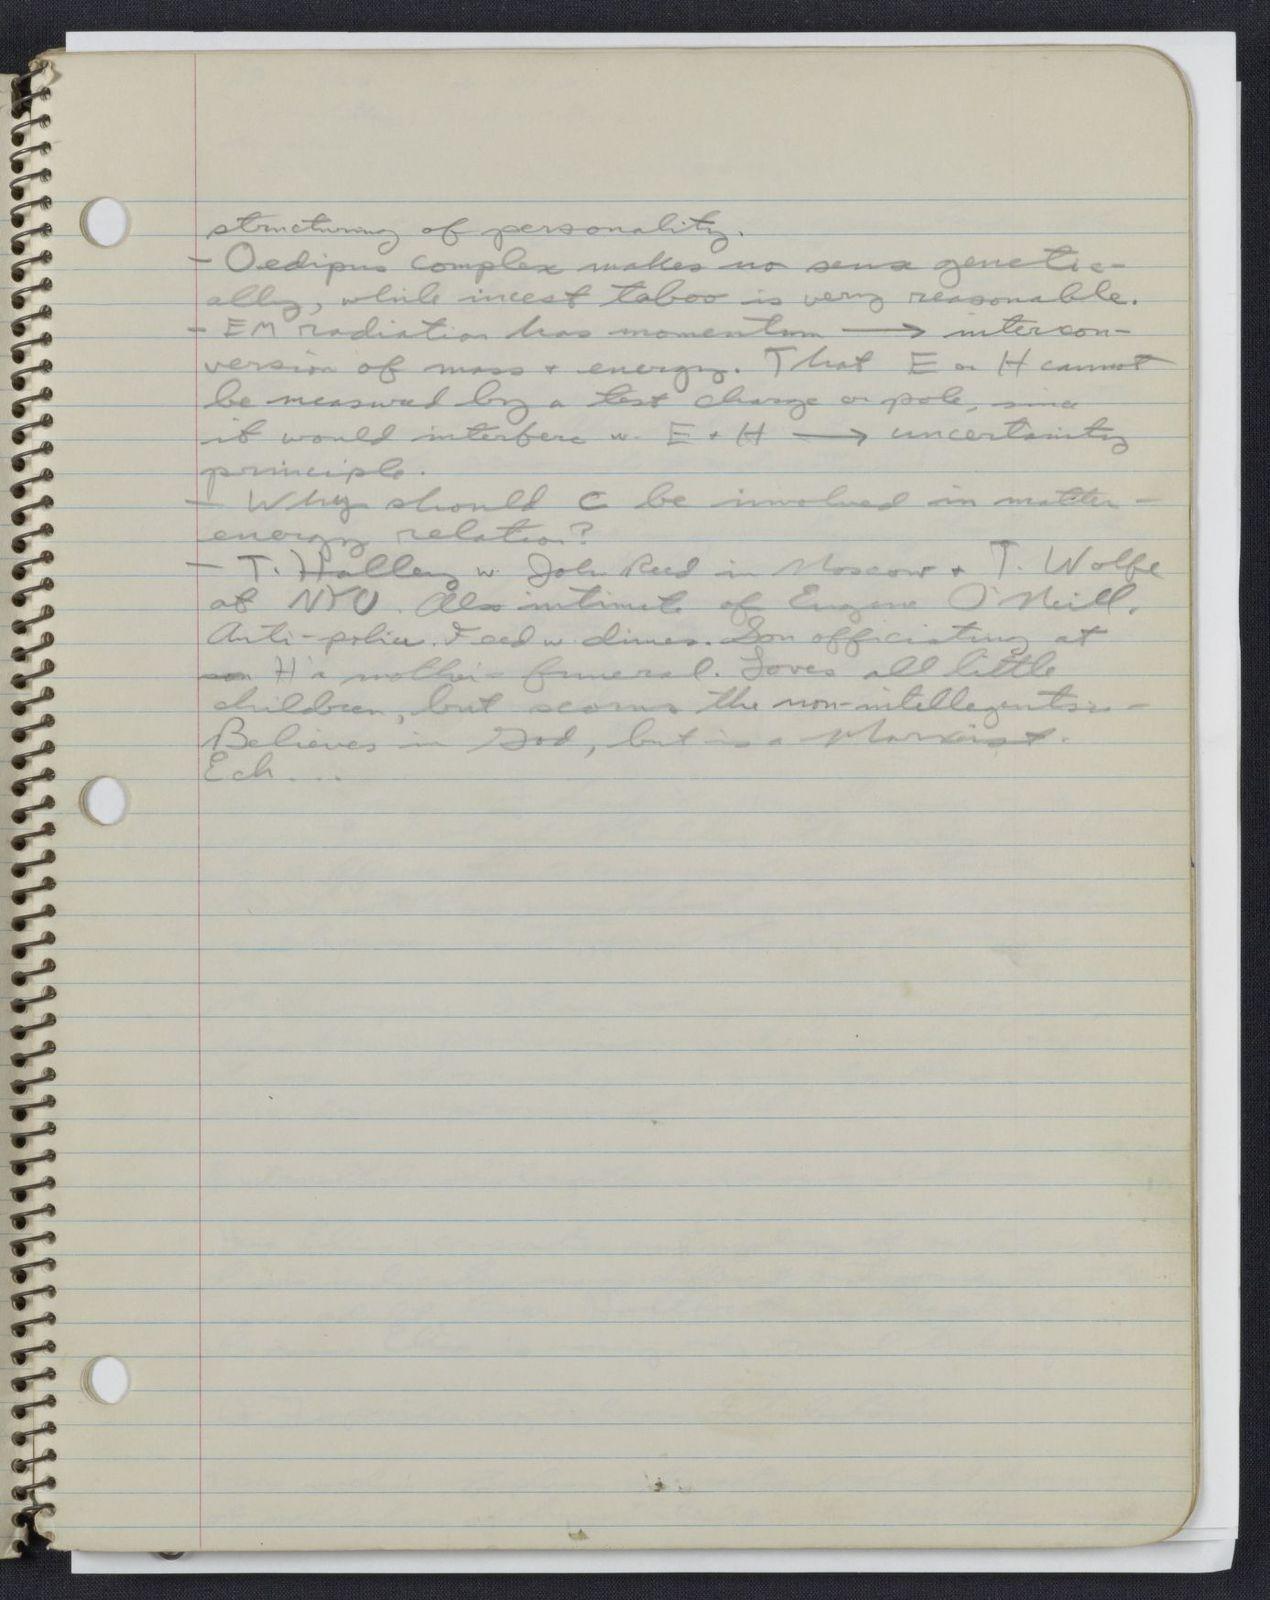 Carl Sagan's University of Chicago notebook